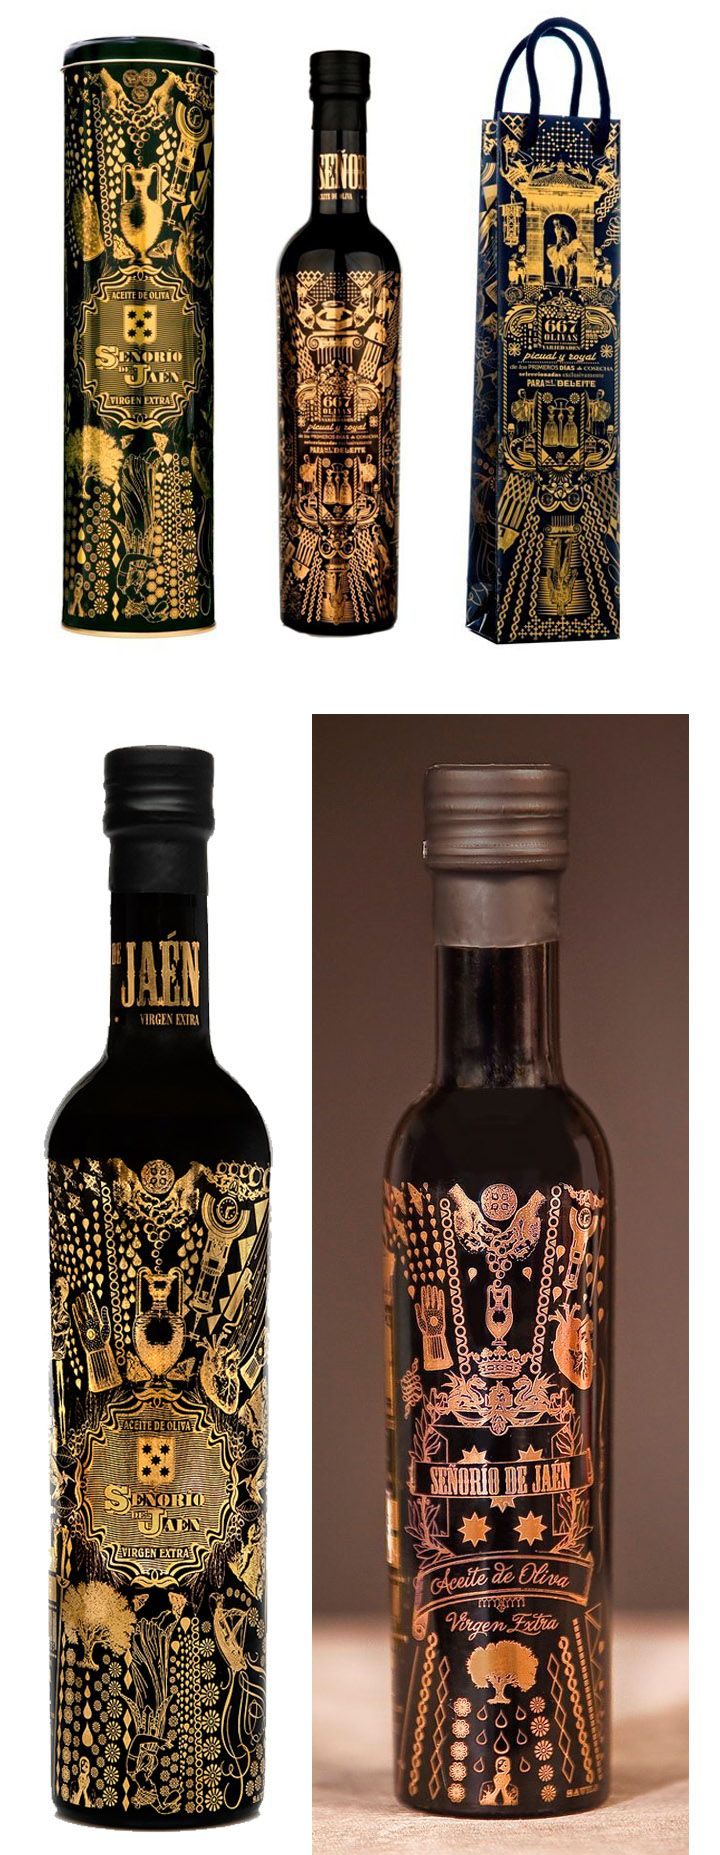 Senorio de Jaen Olive oils; Virgin, Extra Virgin and 667 and packaging